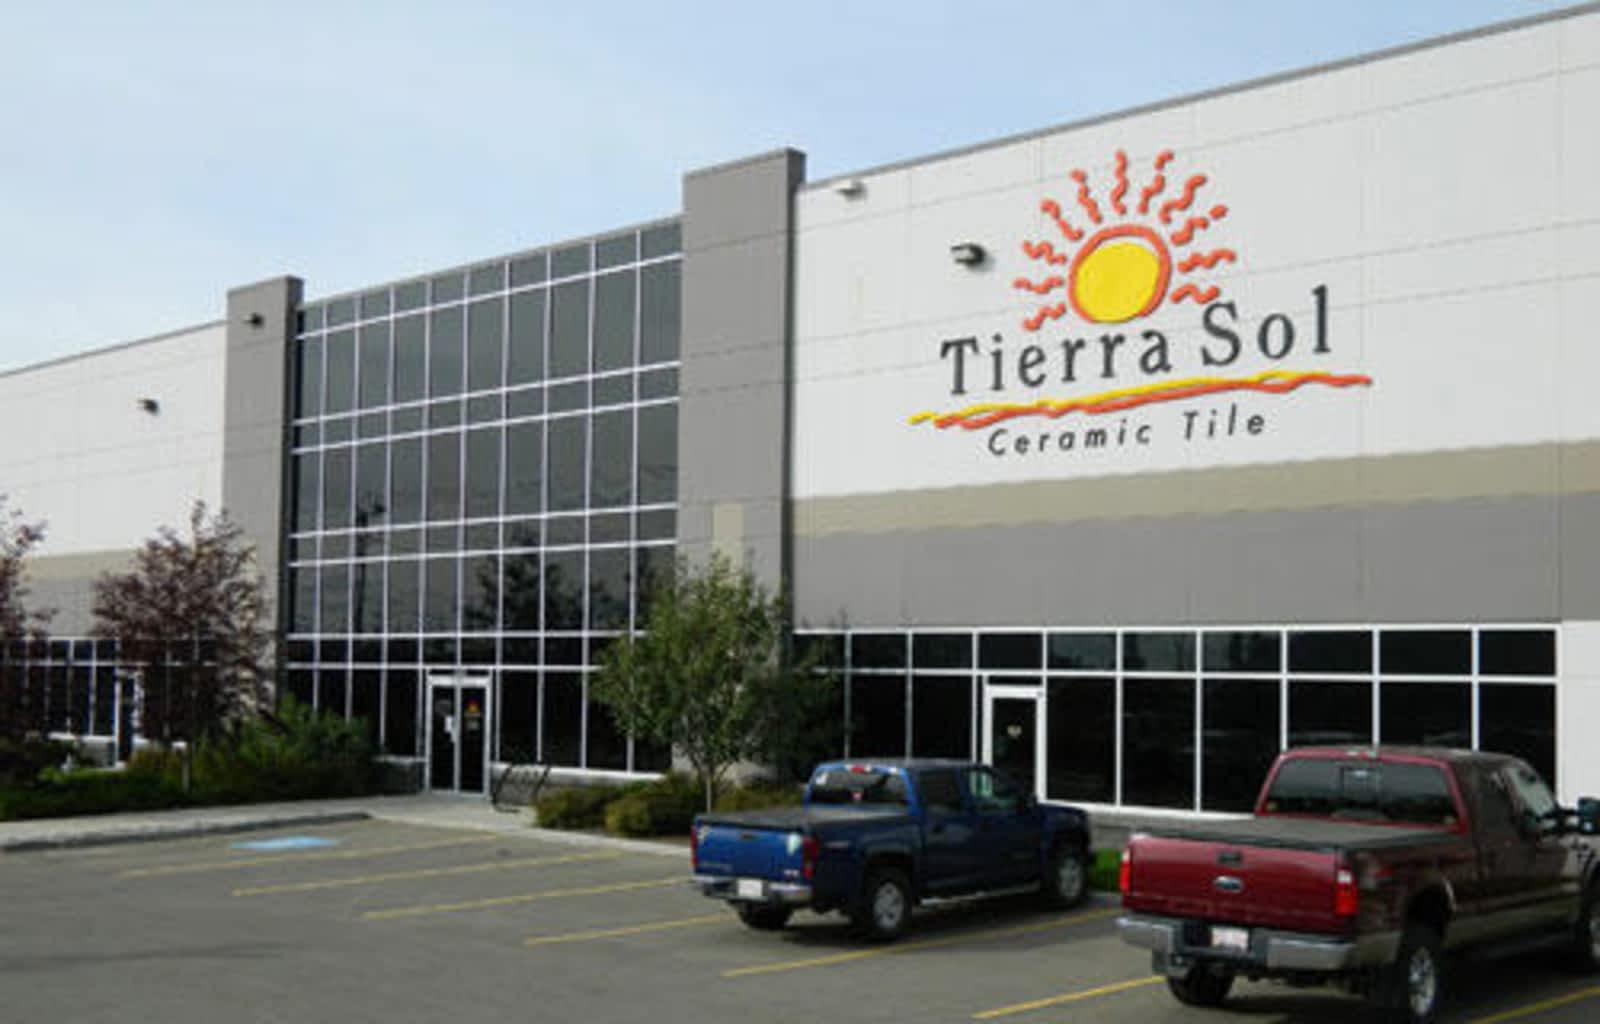 Tierra sol ceramic tile ltd opening hours 12410 184 st nw tierra sol ceramic tile ltd opening hours 12410 184 st nw edmonton ab dailygadgetfo Choice Image